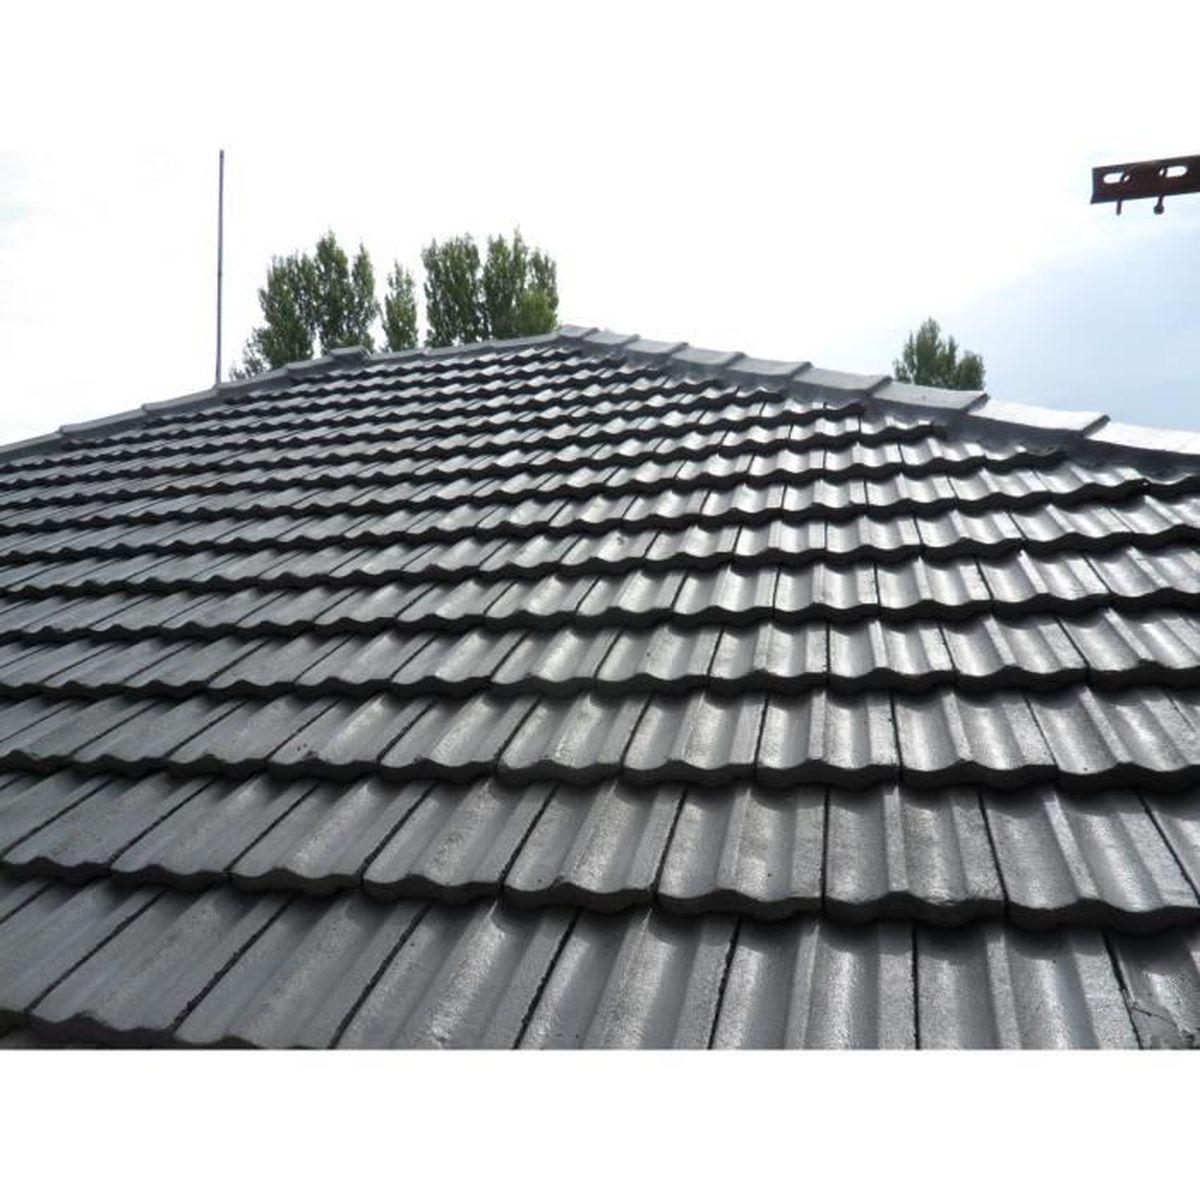 20 litre peinture rev tement toiture toit tuile anthracite achat vente peinture vernis